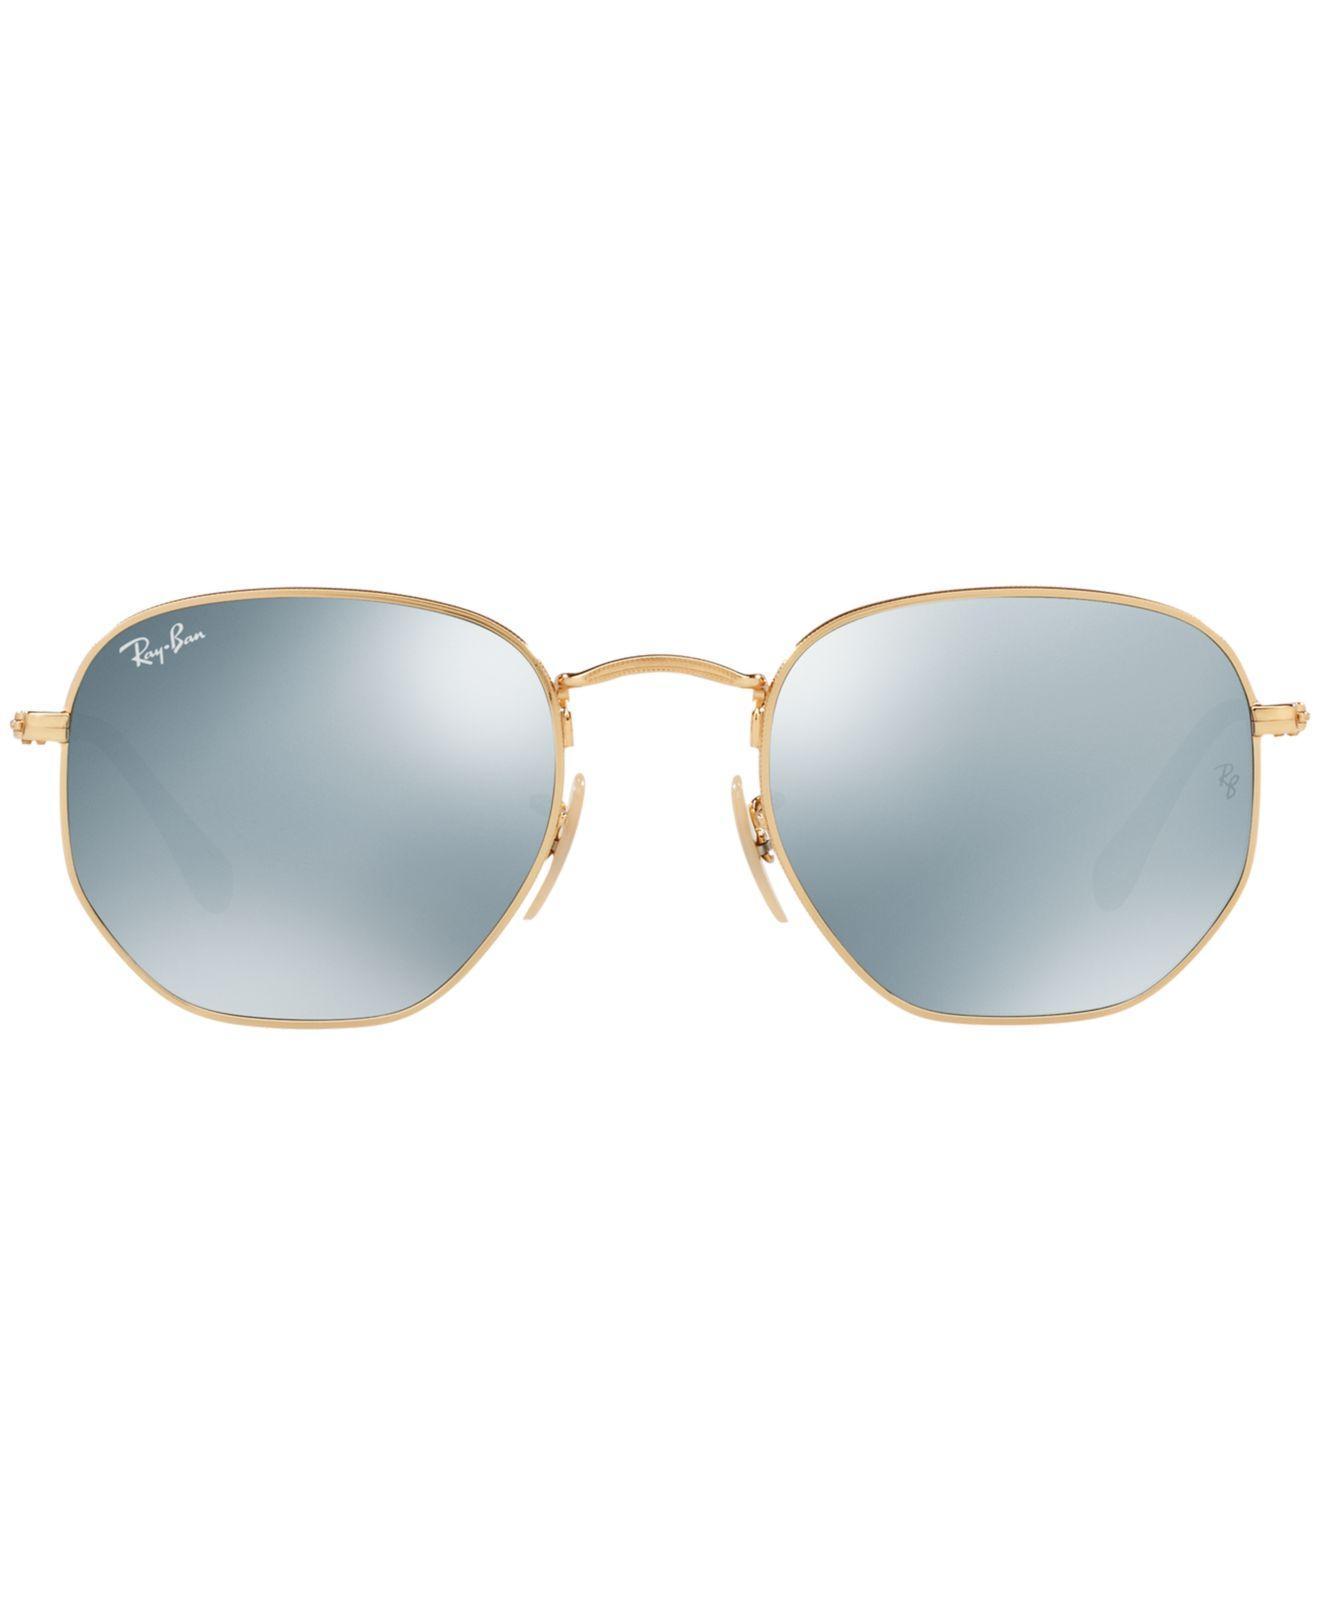 9346ba125ceb Lyst - Ray-Ban Hexagonal Flat Lenses in Metallic for Men - Save 2%